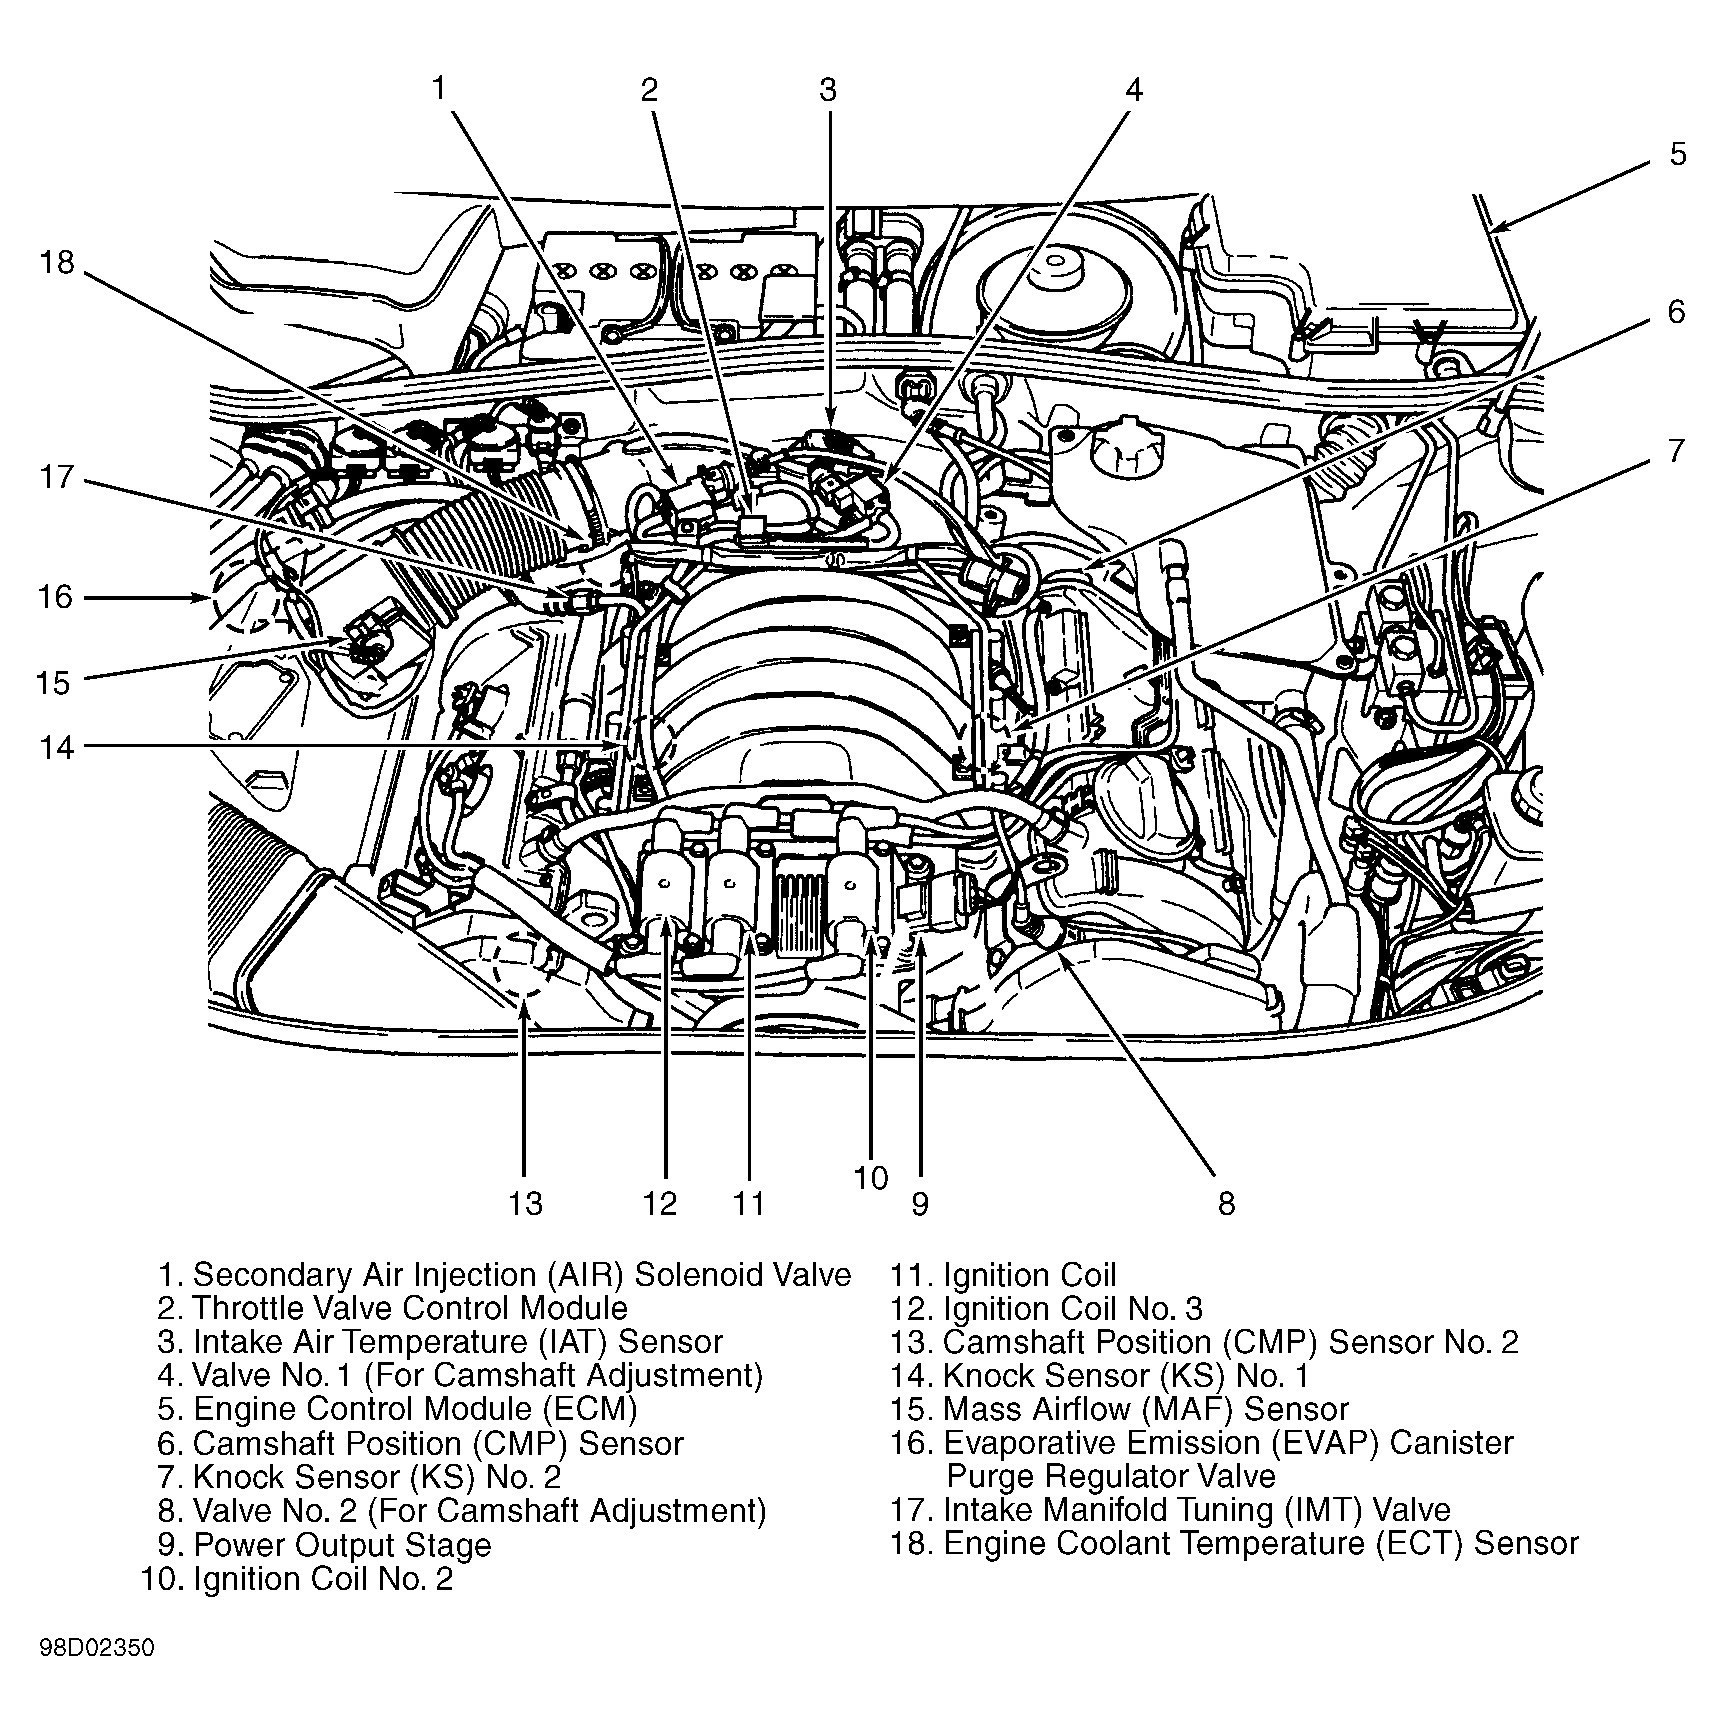 Air Cooled Engine Diagram 2 7t Engine Diagram Of Air Cooled Engine Diagram